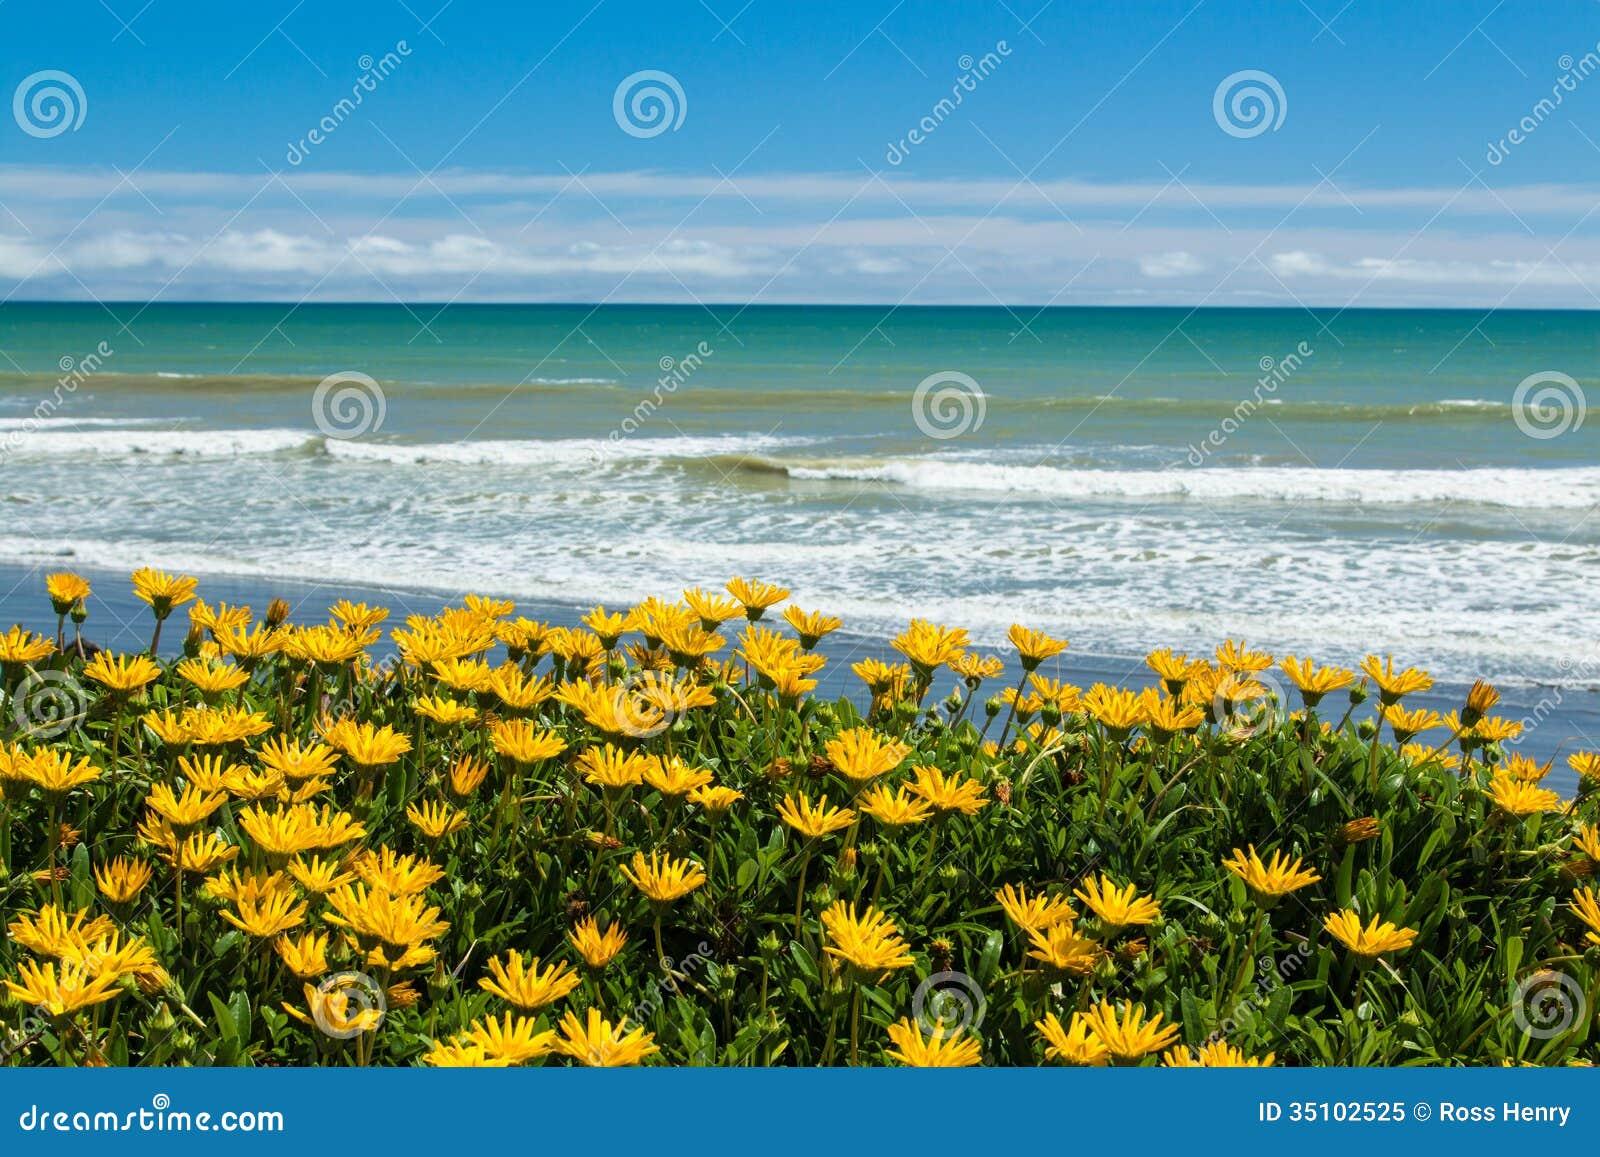 Beach Flowers Royalty Free Stock Photo - Image: 35102525